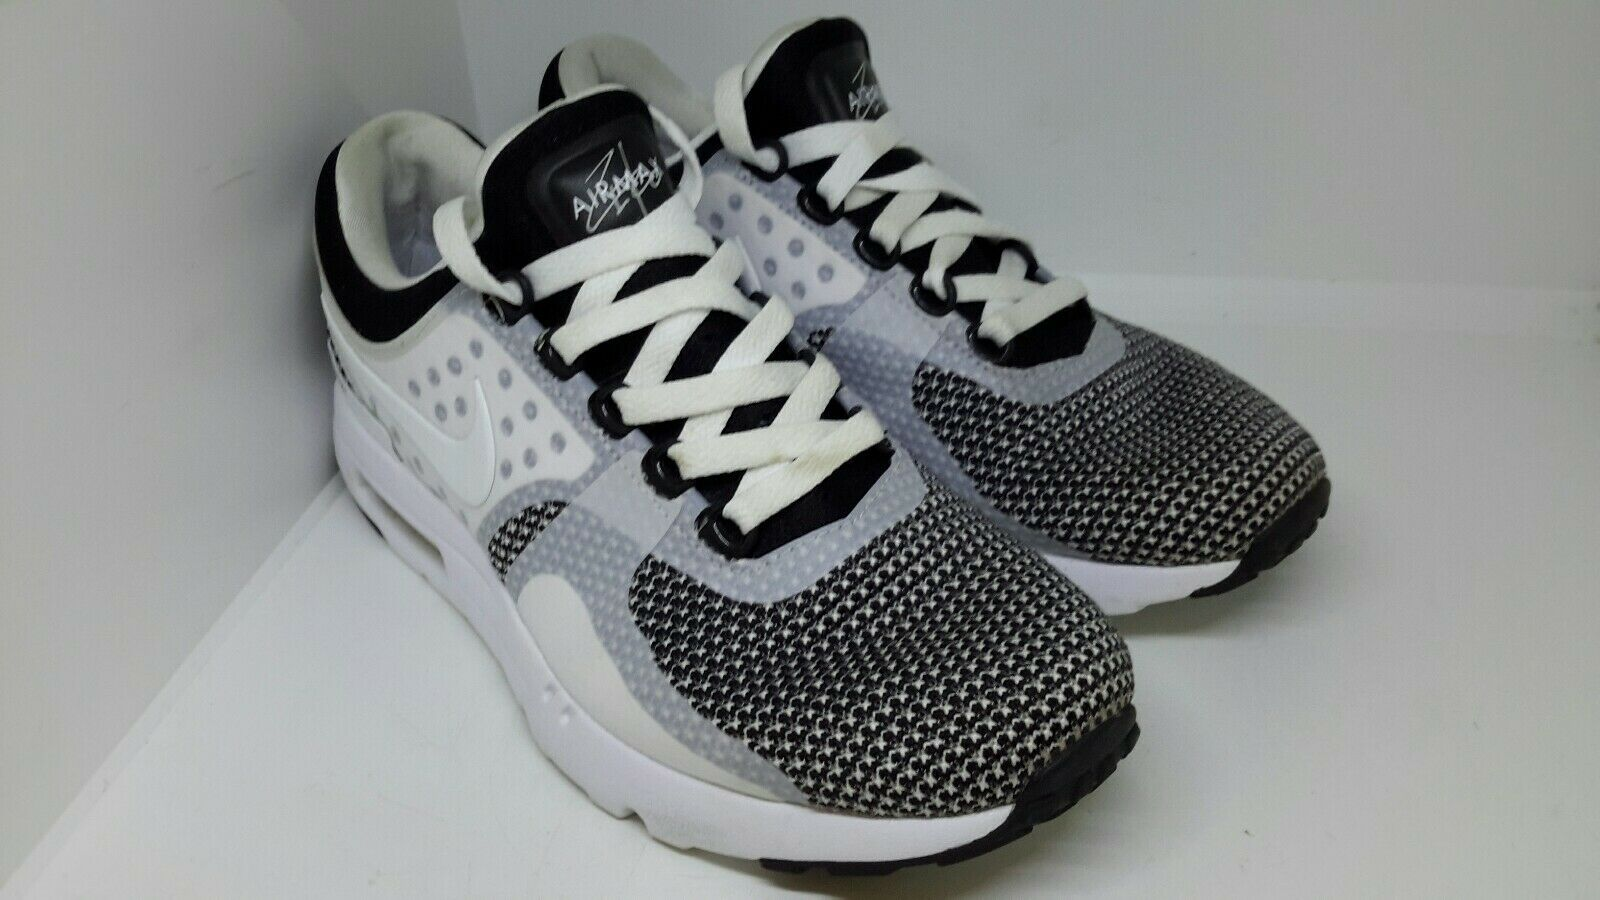 Nike AIR MAX ZERO ESSENZIALE Da Uomo Sz 7 EU41 US8 Nero Bianco Grigio Oreo 876070 005